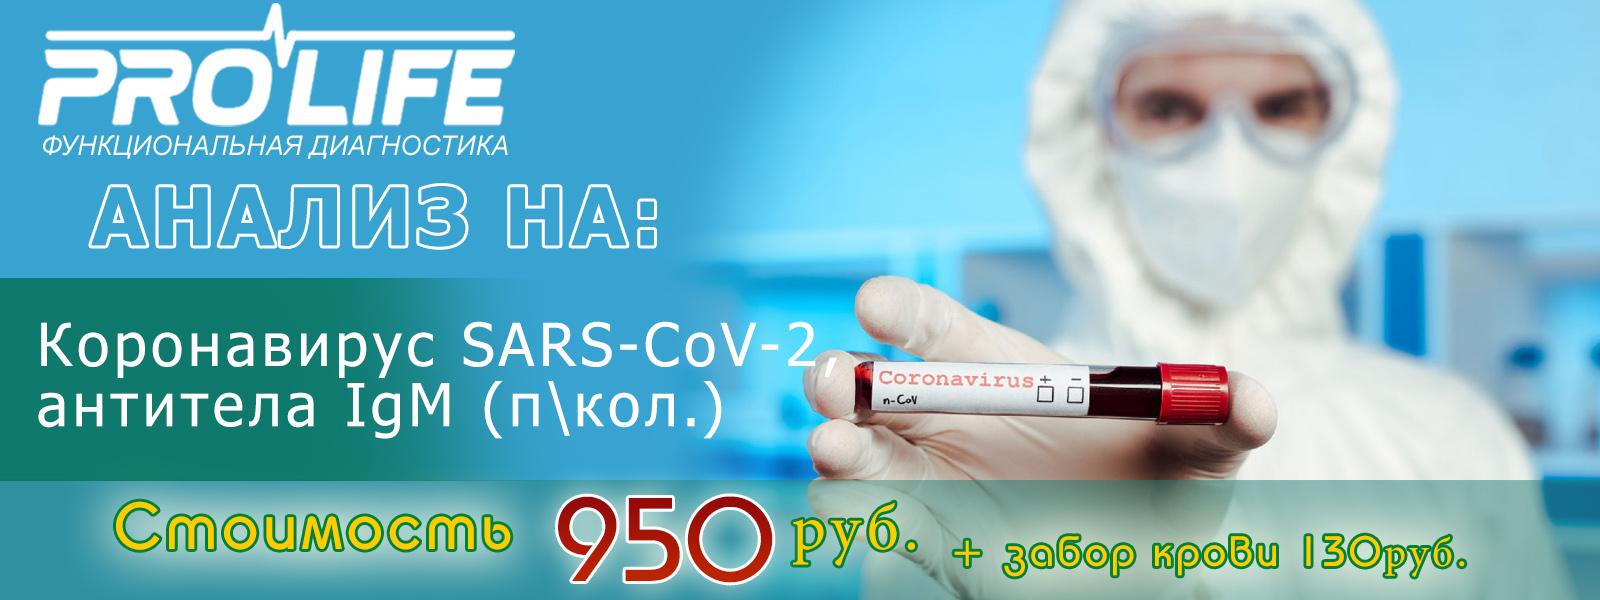 Коронавирус SARS-CoV-2, антитела IgM (п\кол.)